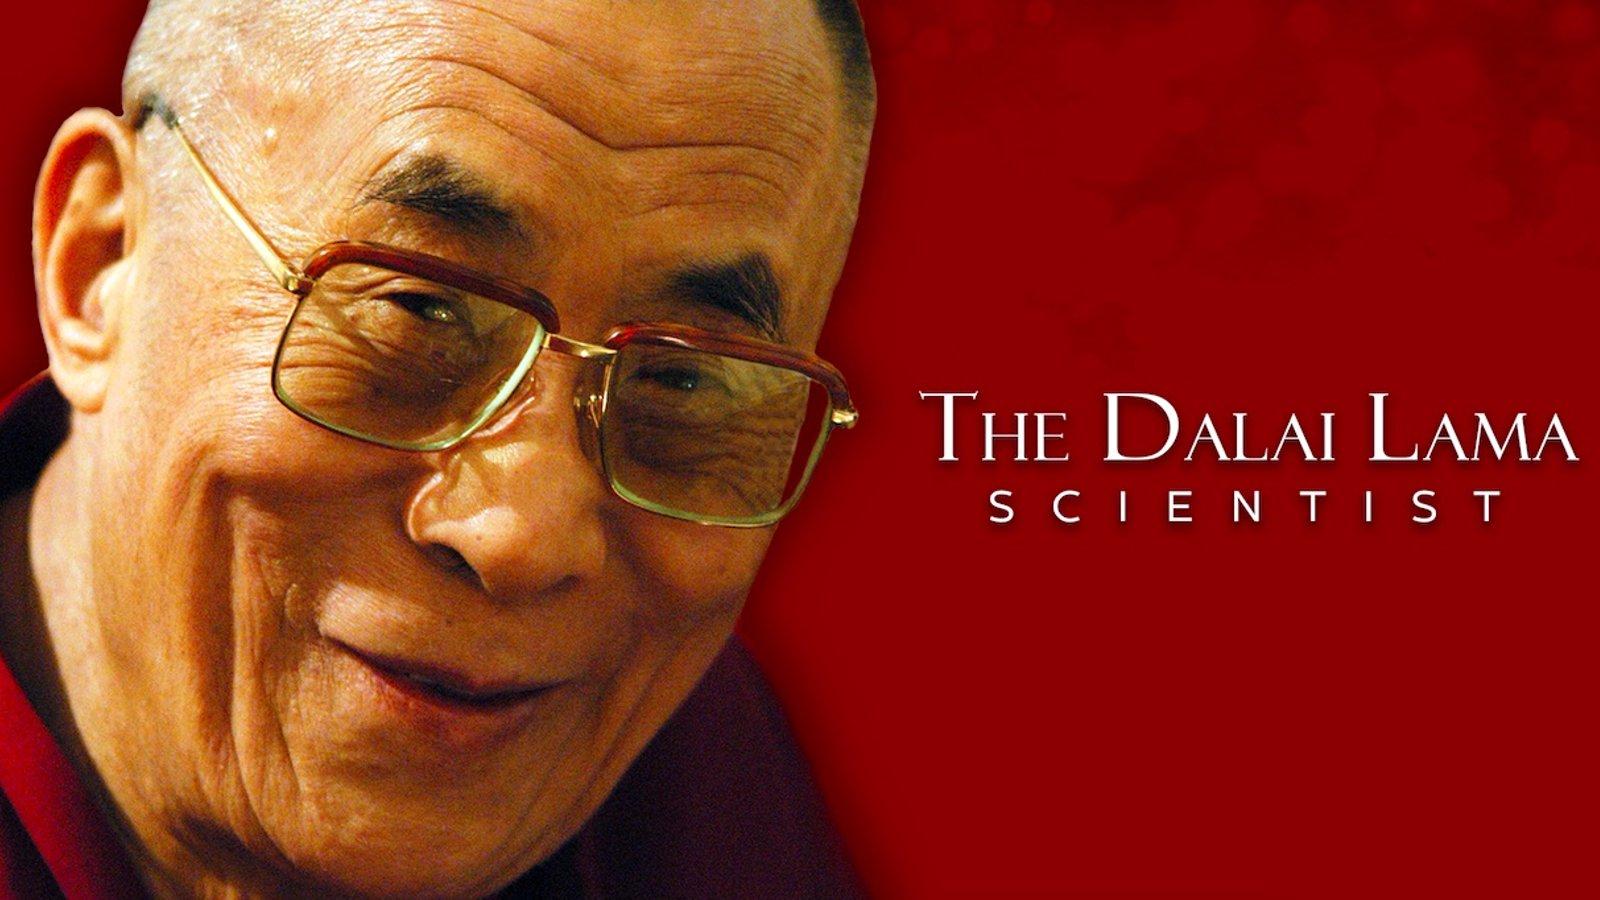 The Dalai Lama - Scientist